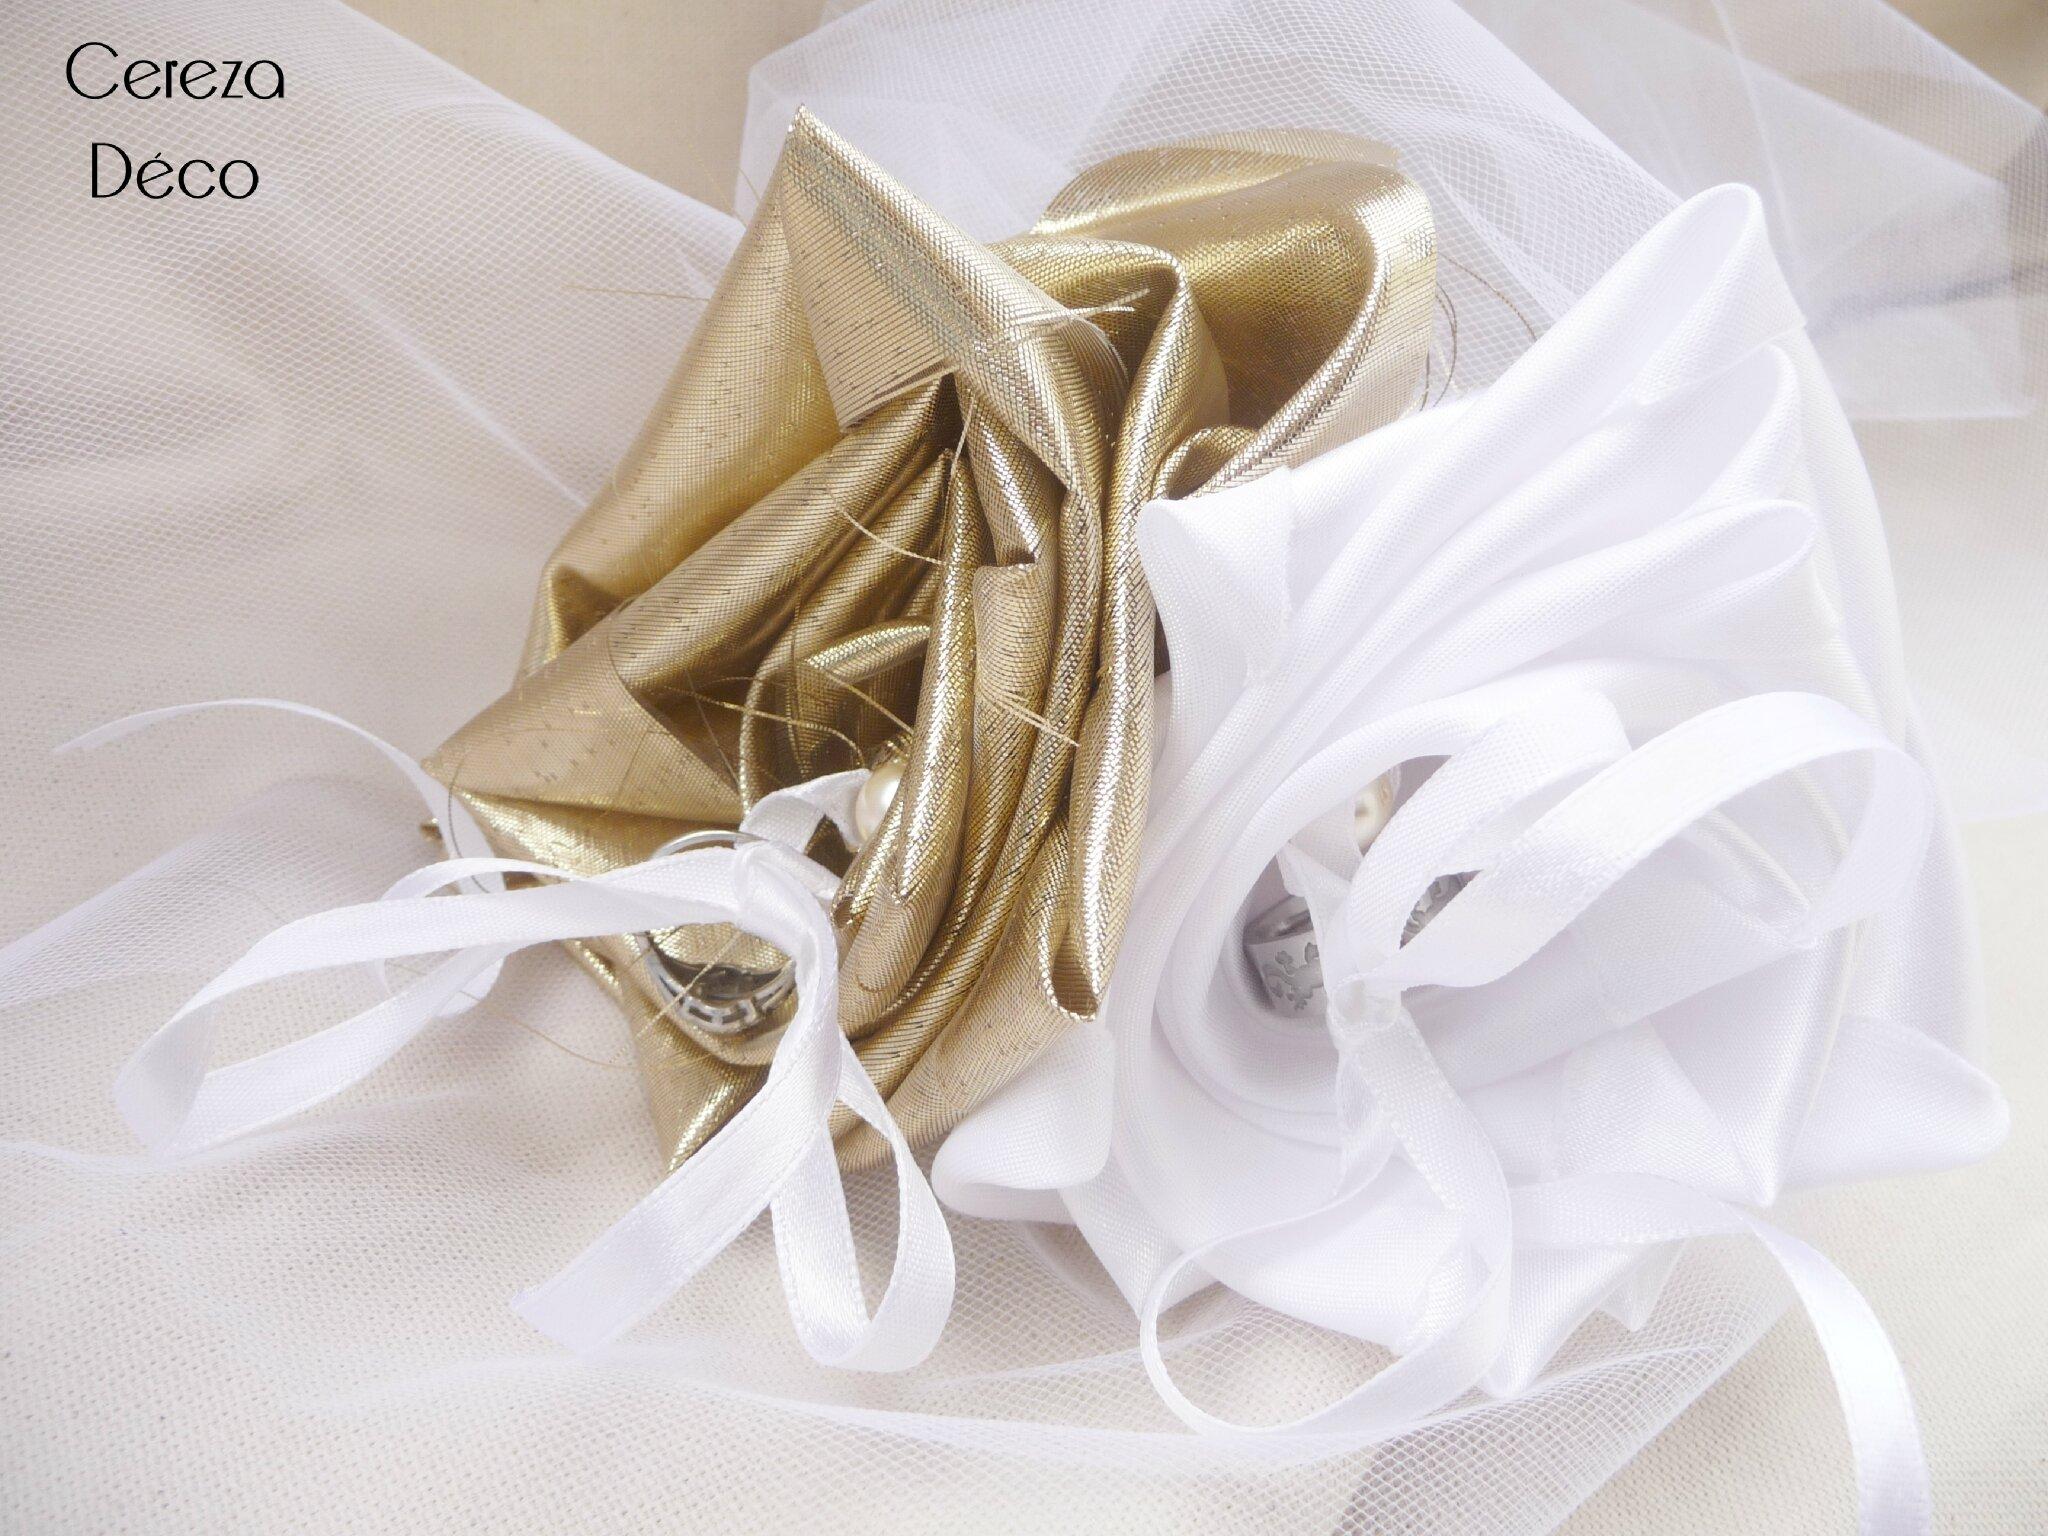 Porte alliance mariage blanc or dor fleur photo de porte alliance orig - Porte alliance mariage ...